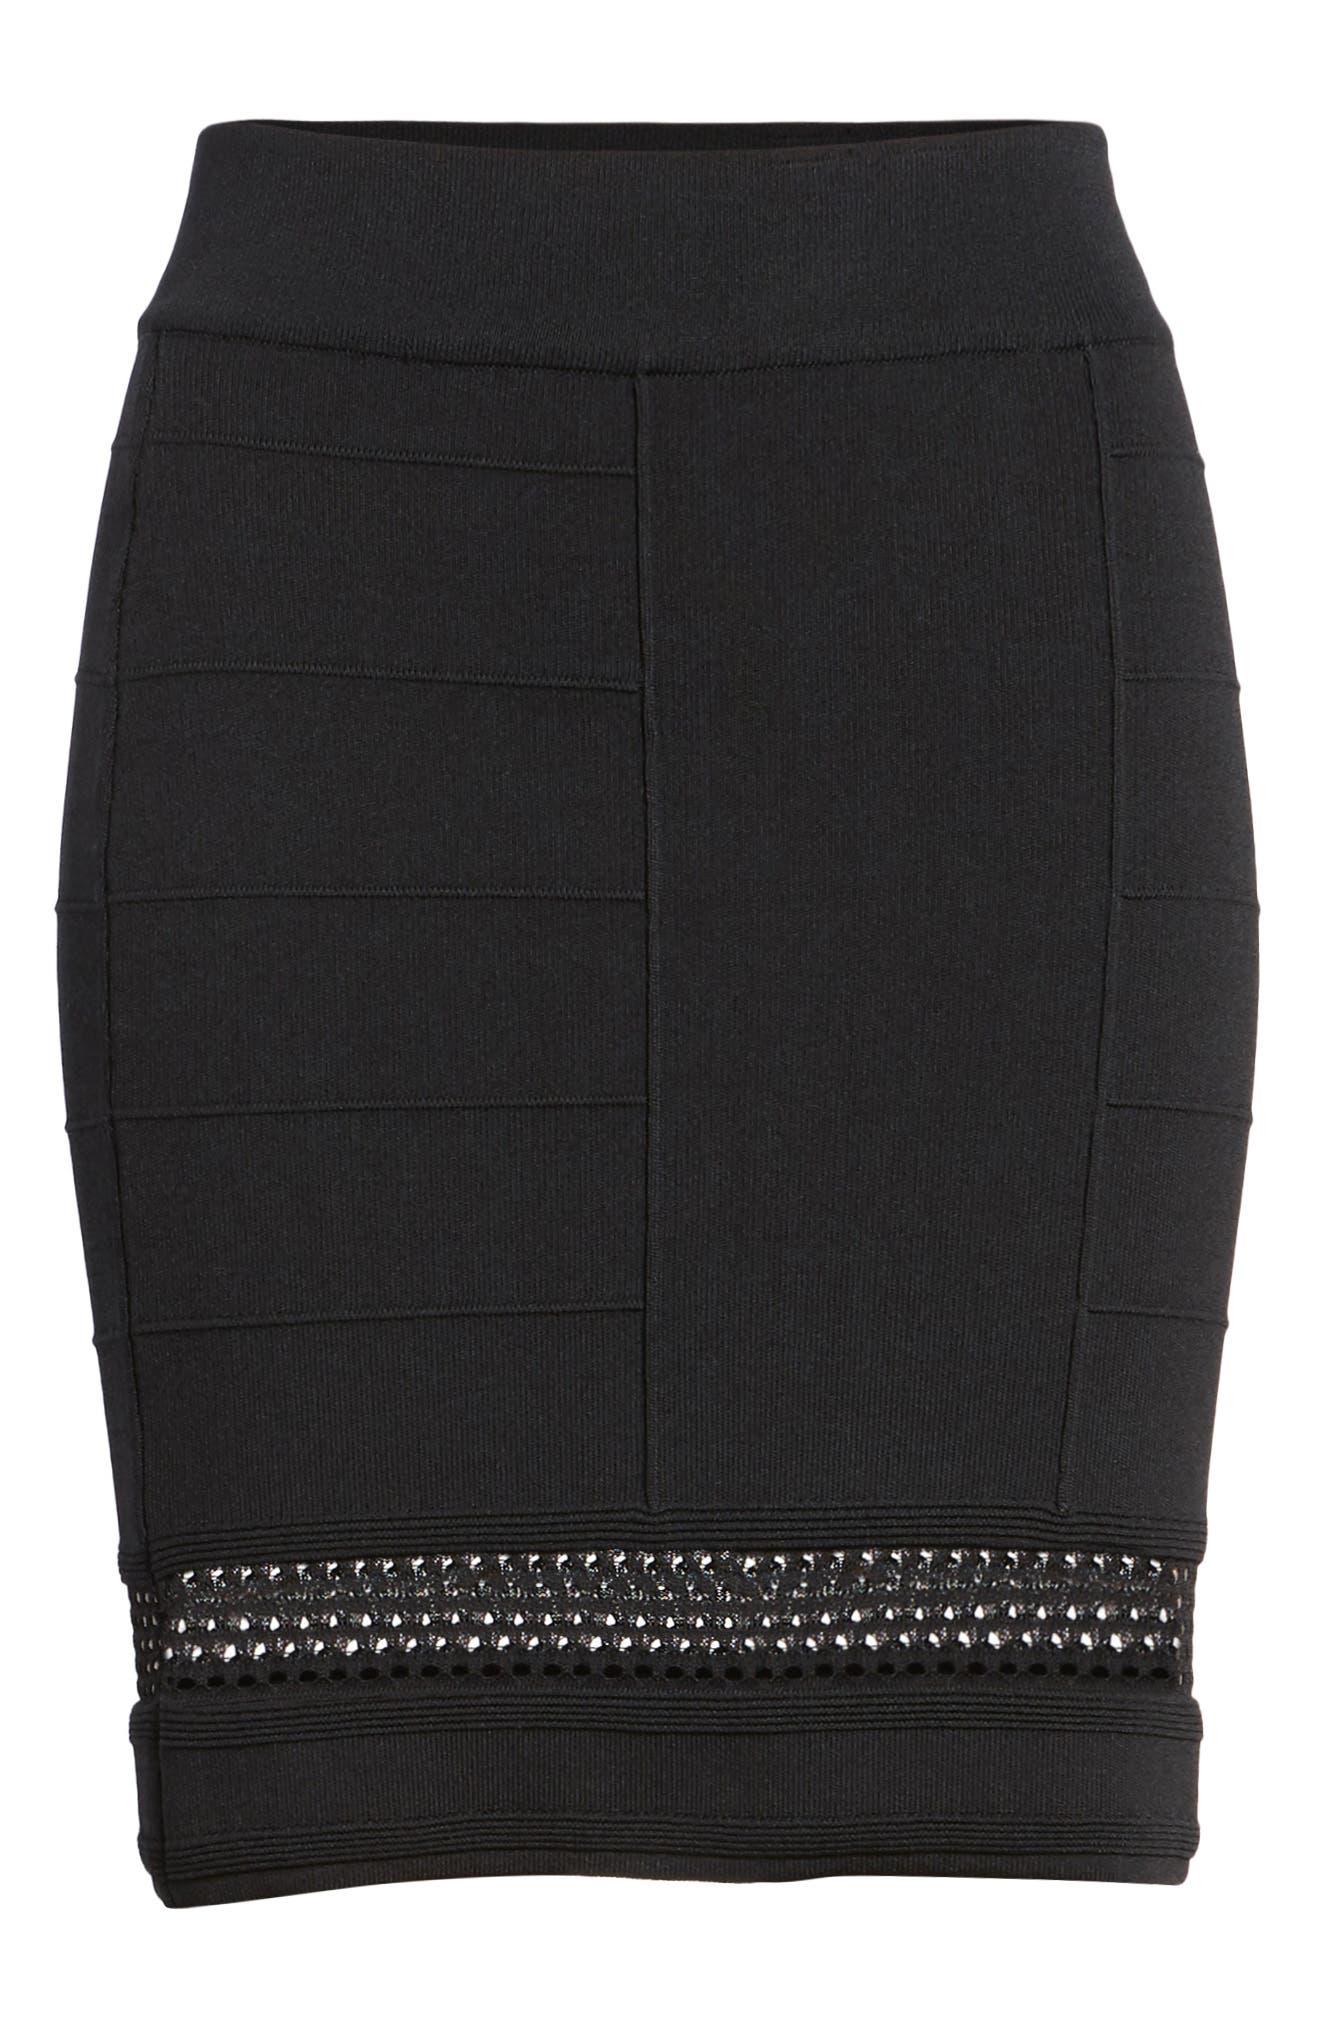 Bishop + Young Siena Peekaboo Skirt,                             Alternate thumbnail 6, color,